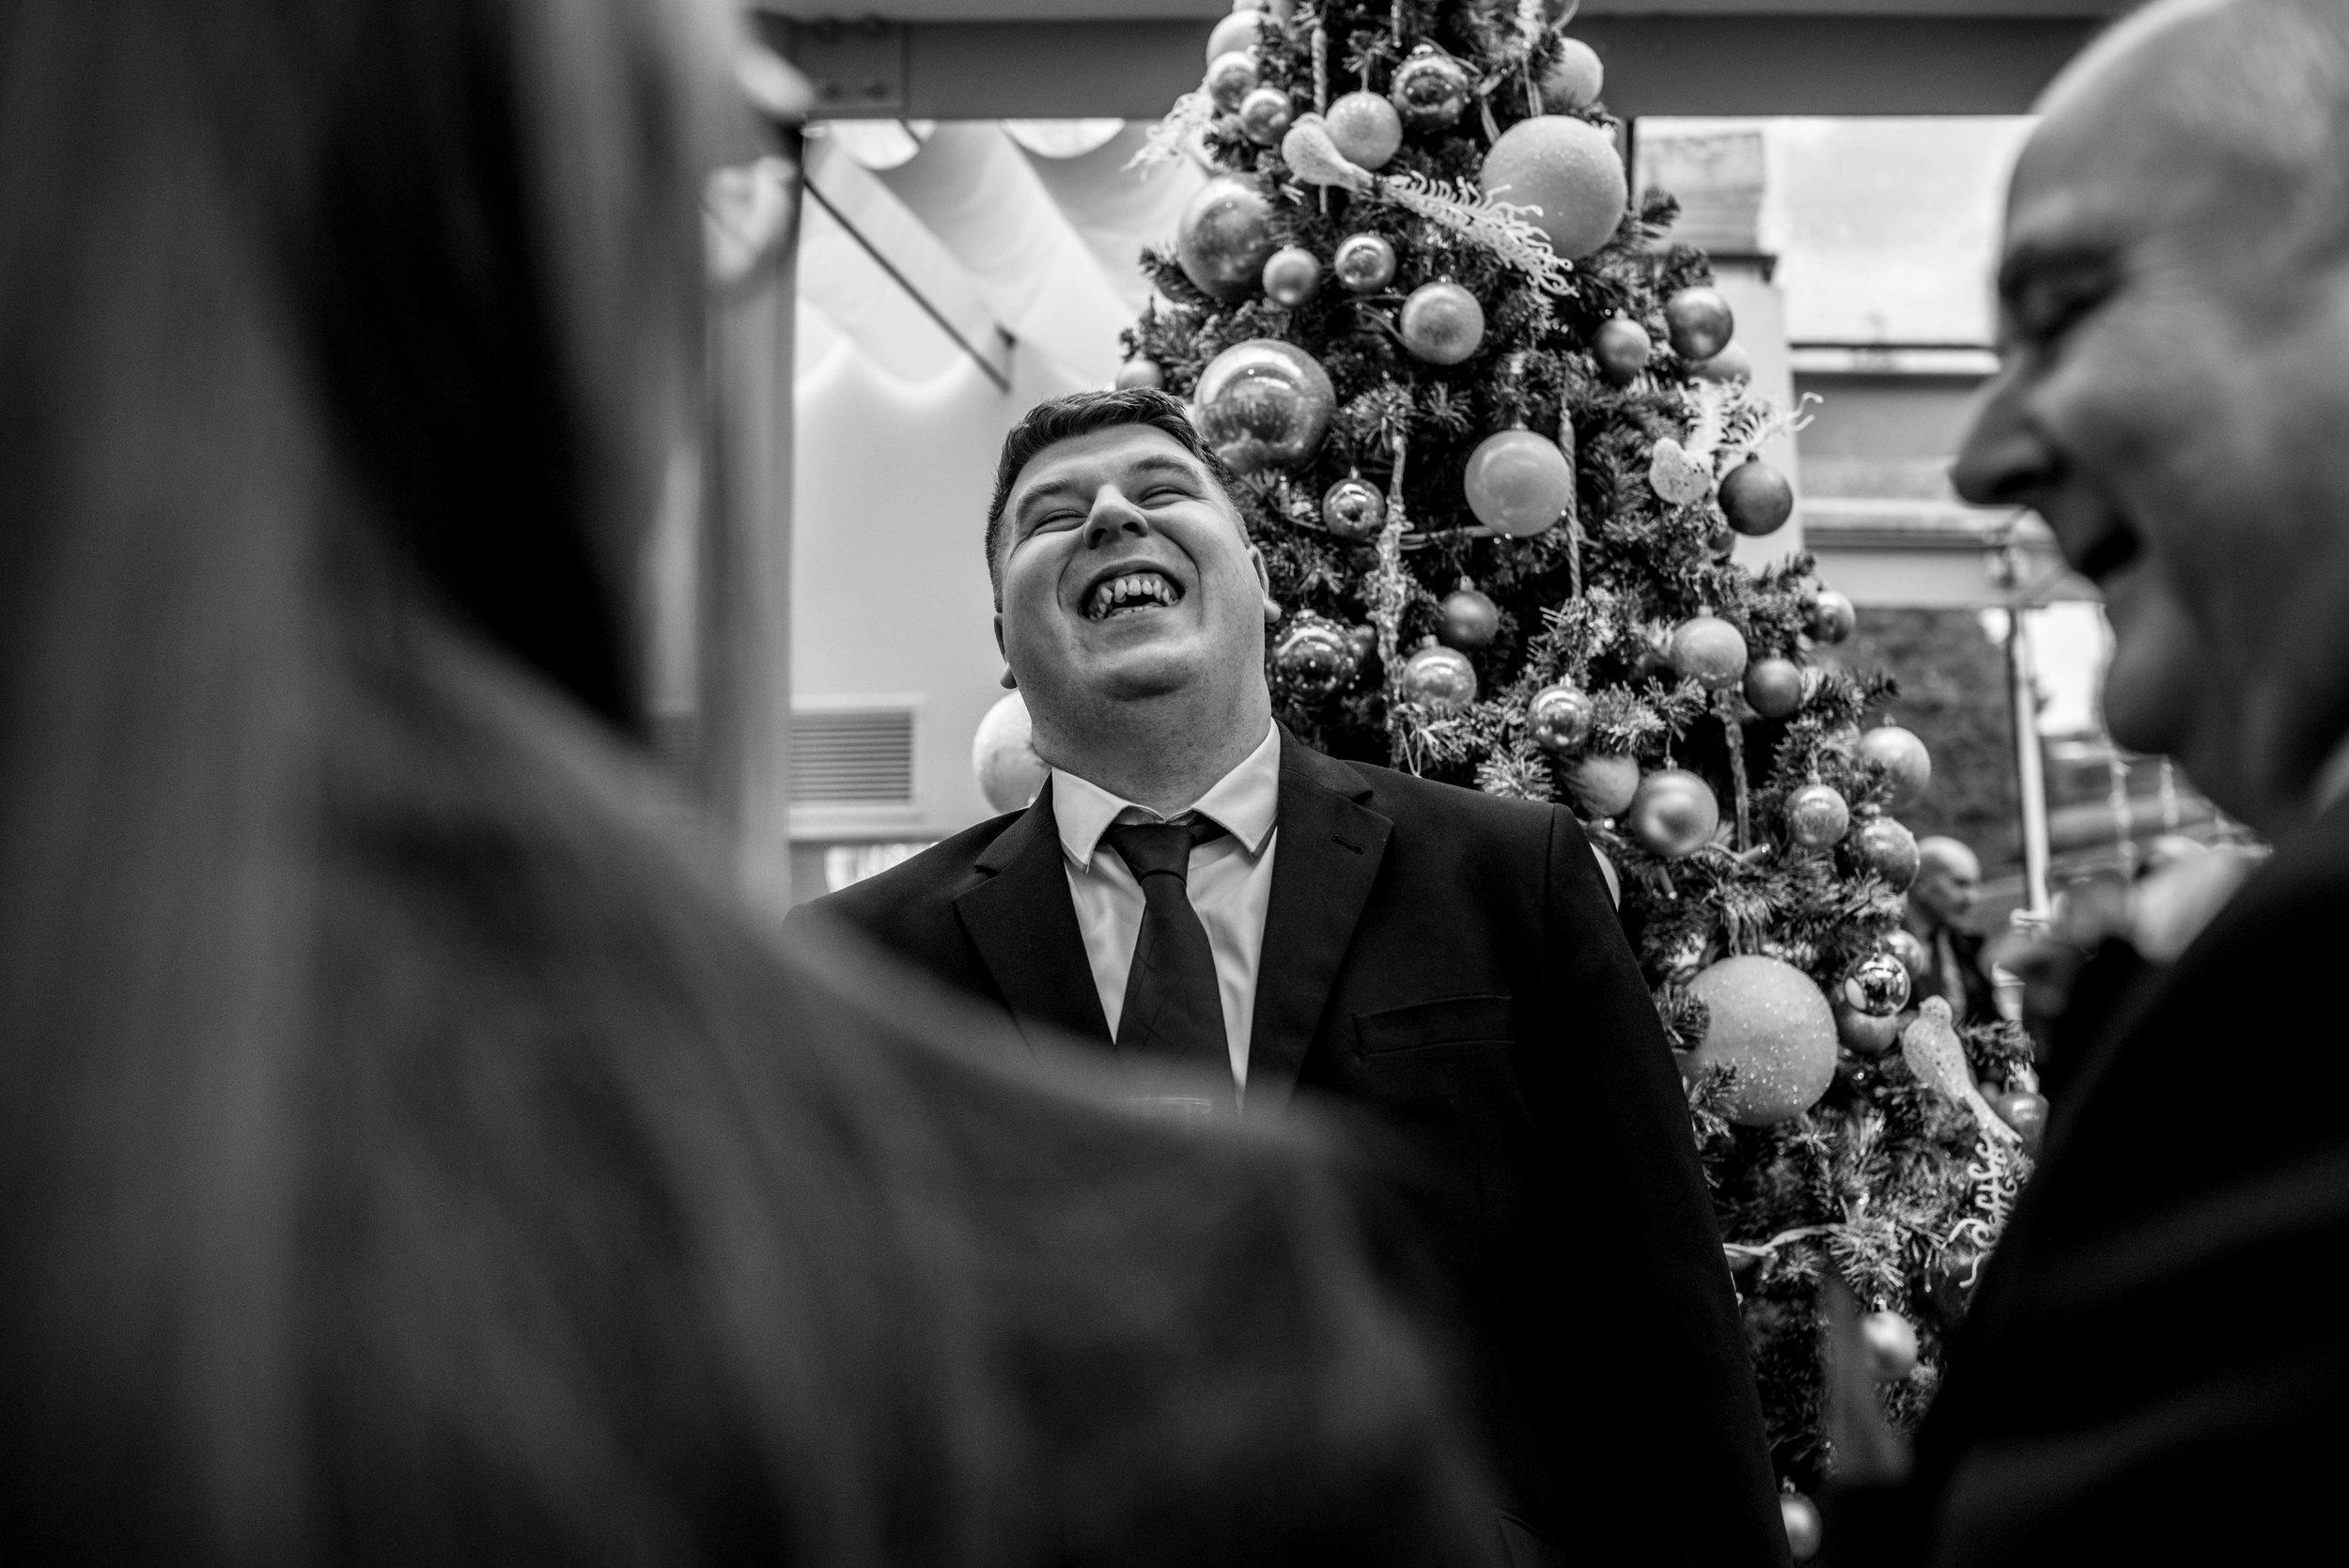 Belsfield-wedding-photography-22.jpg